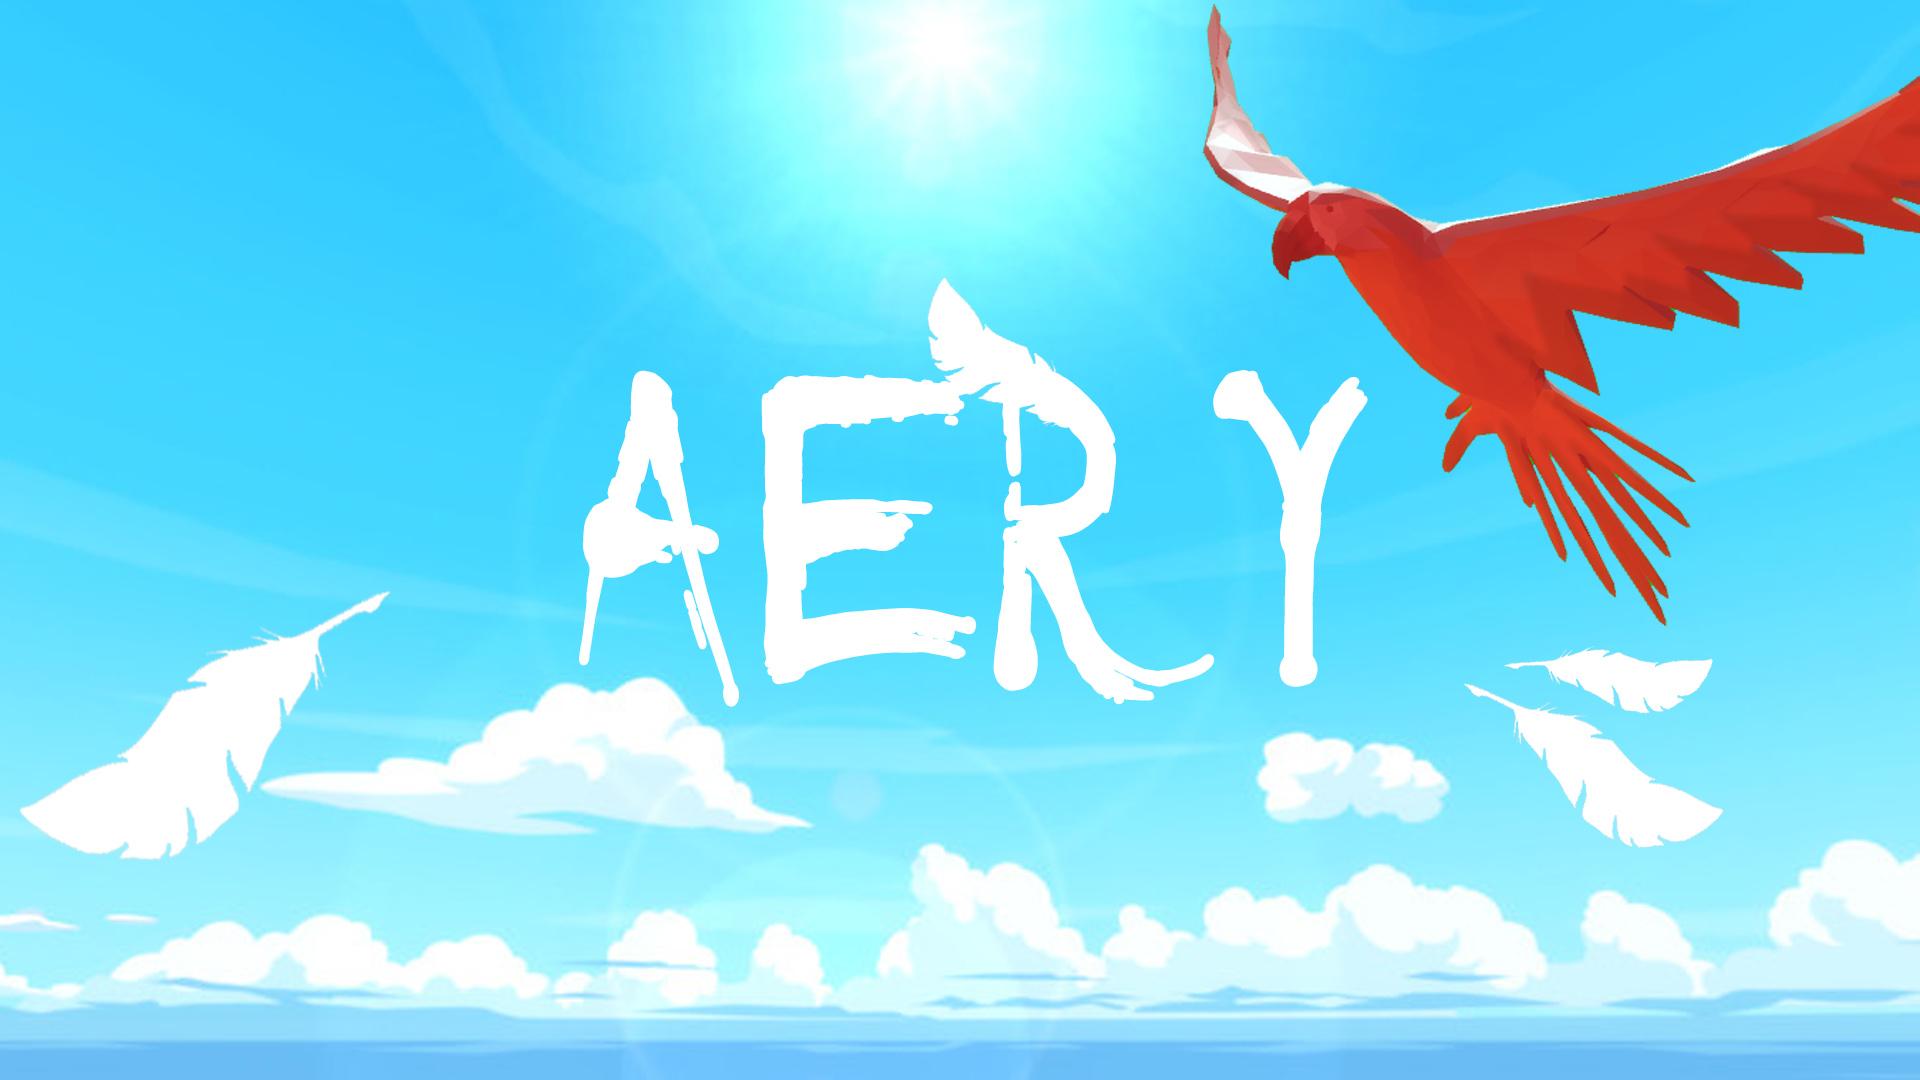 aery little bird adventure game wallpaper 73453